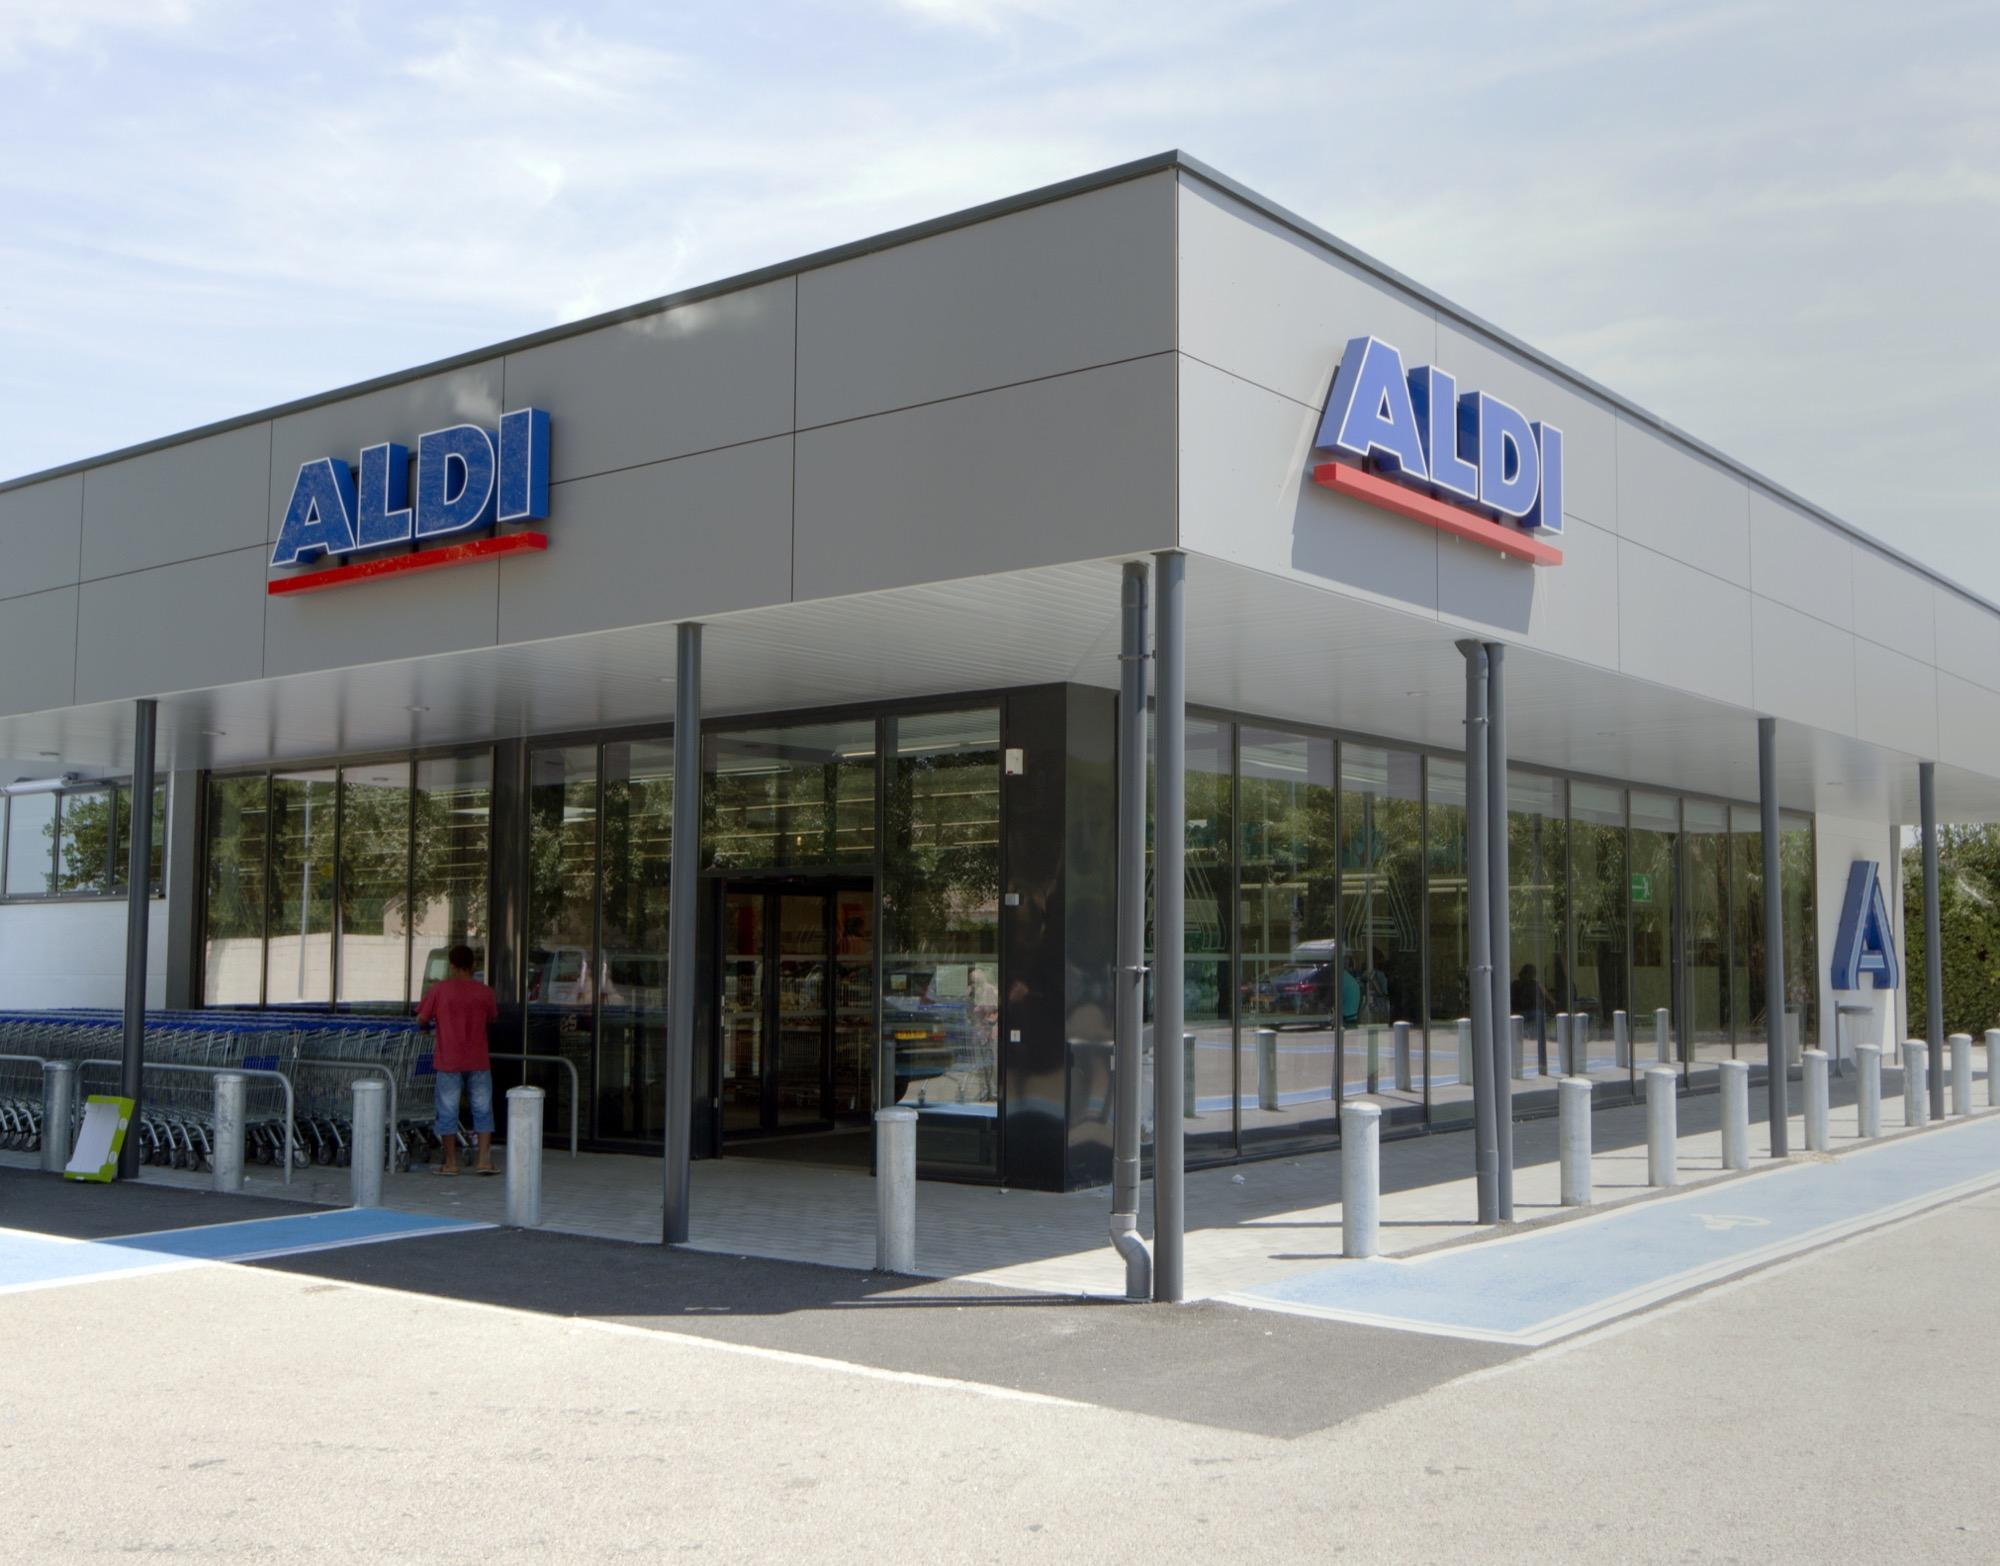 Aldi Kühlschrank Nord : Aldi nord prospekt kühlschrank aldi preishammer lenovo moto g